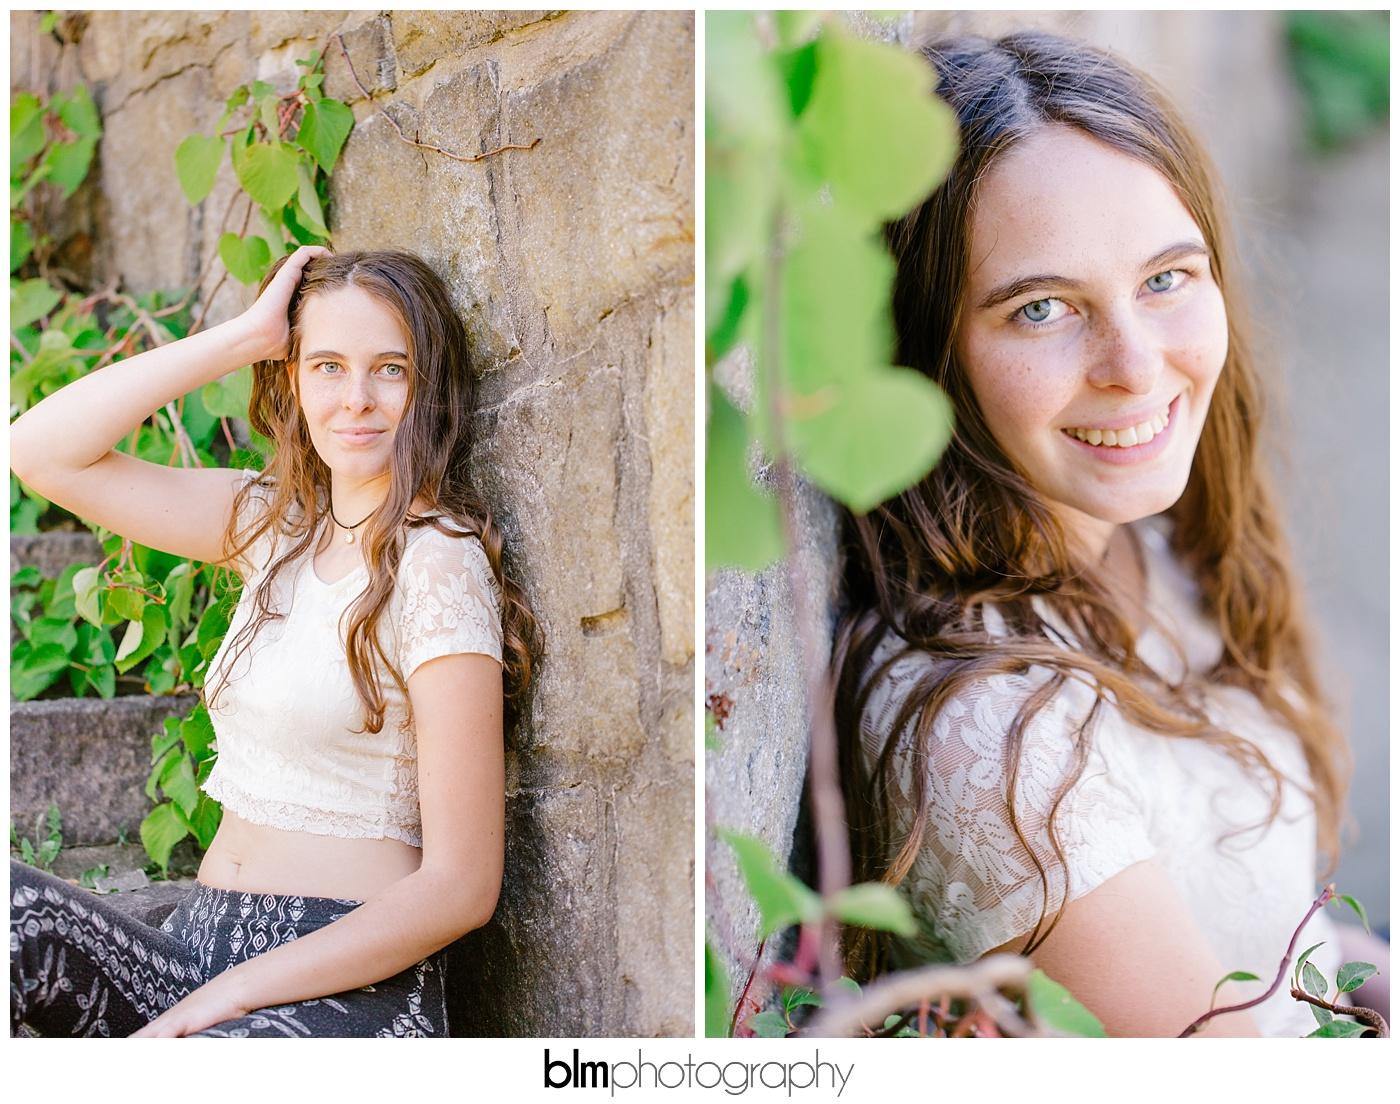 Carly-Cresta_Senior-Portraits_091516-2994.jpg